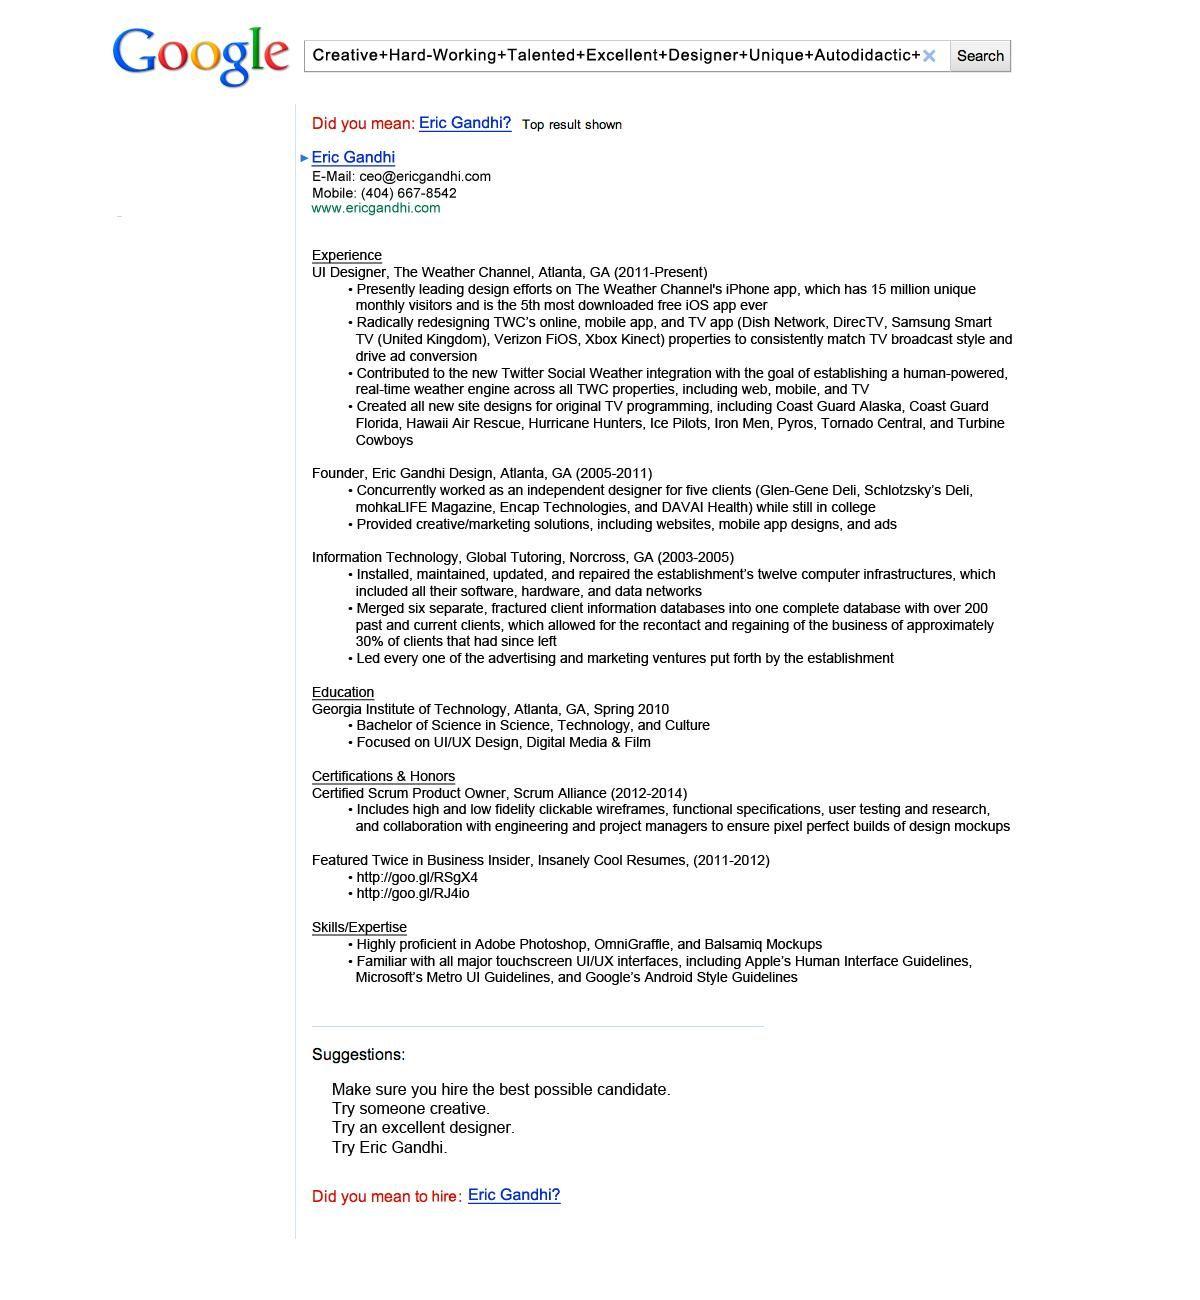 Google Resume by Eric Gandhi #Creative Resume | \